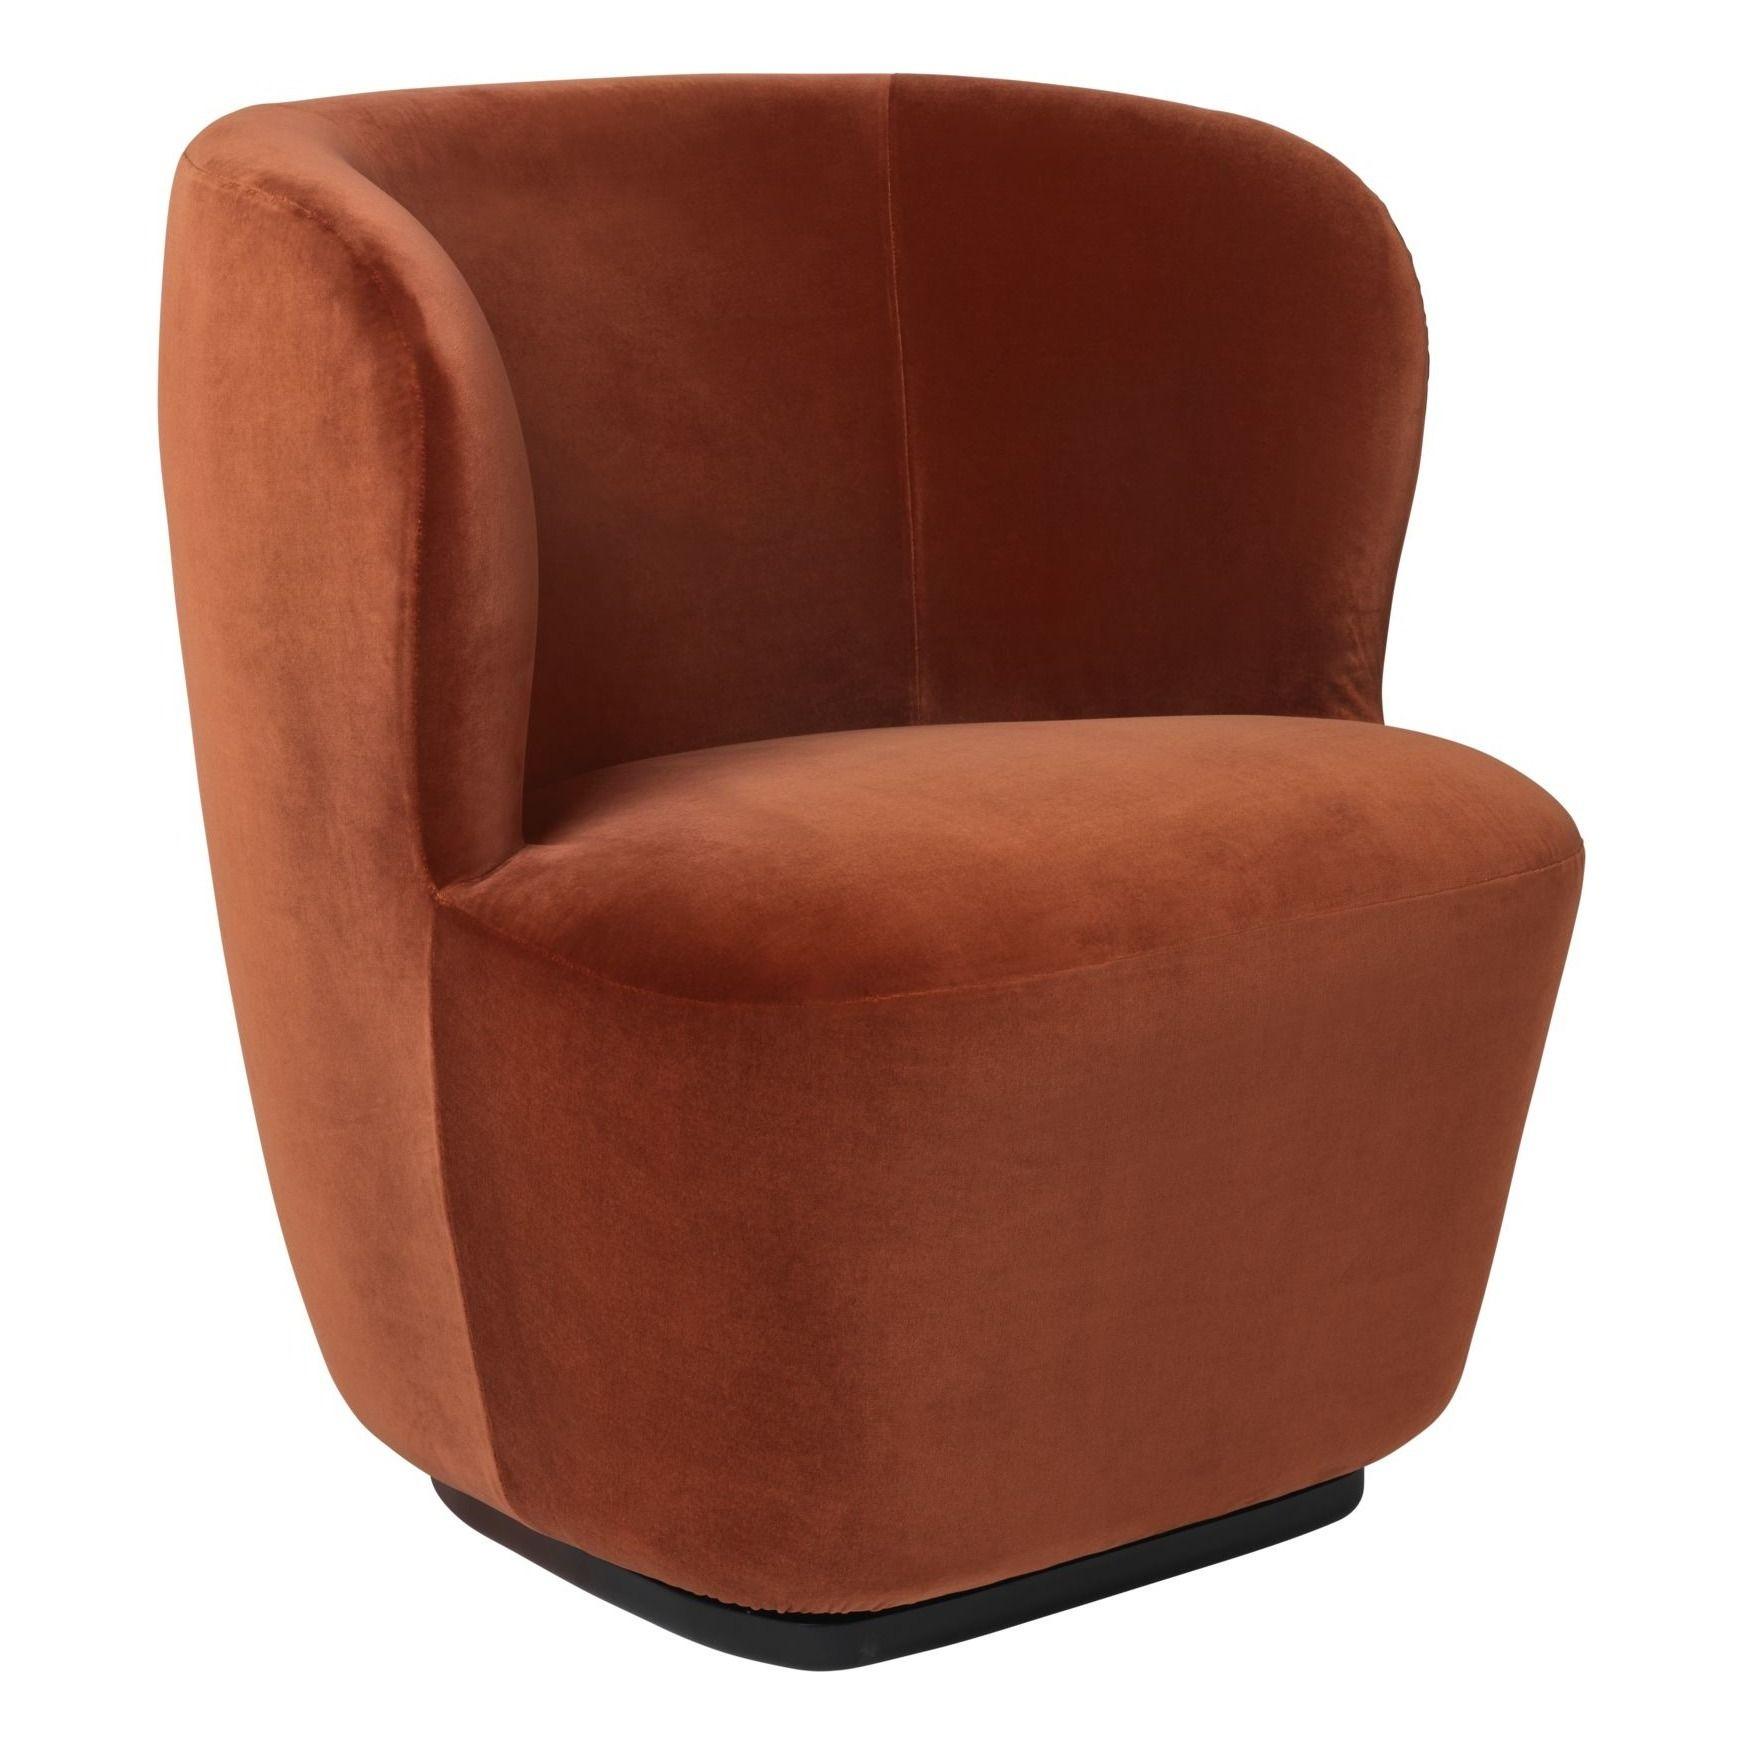 Stay Lounge Chair Grey в 2020 г Мягкая мебель Кресло и